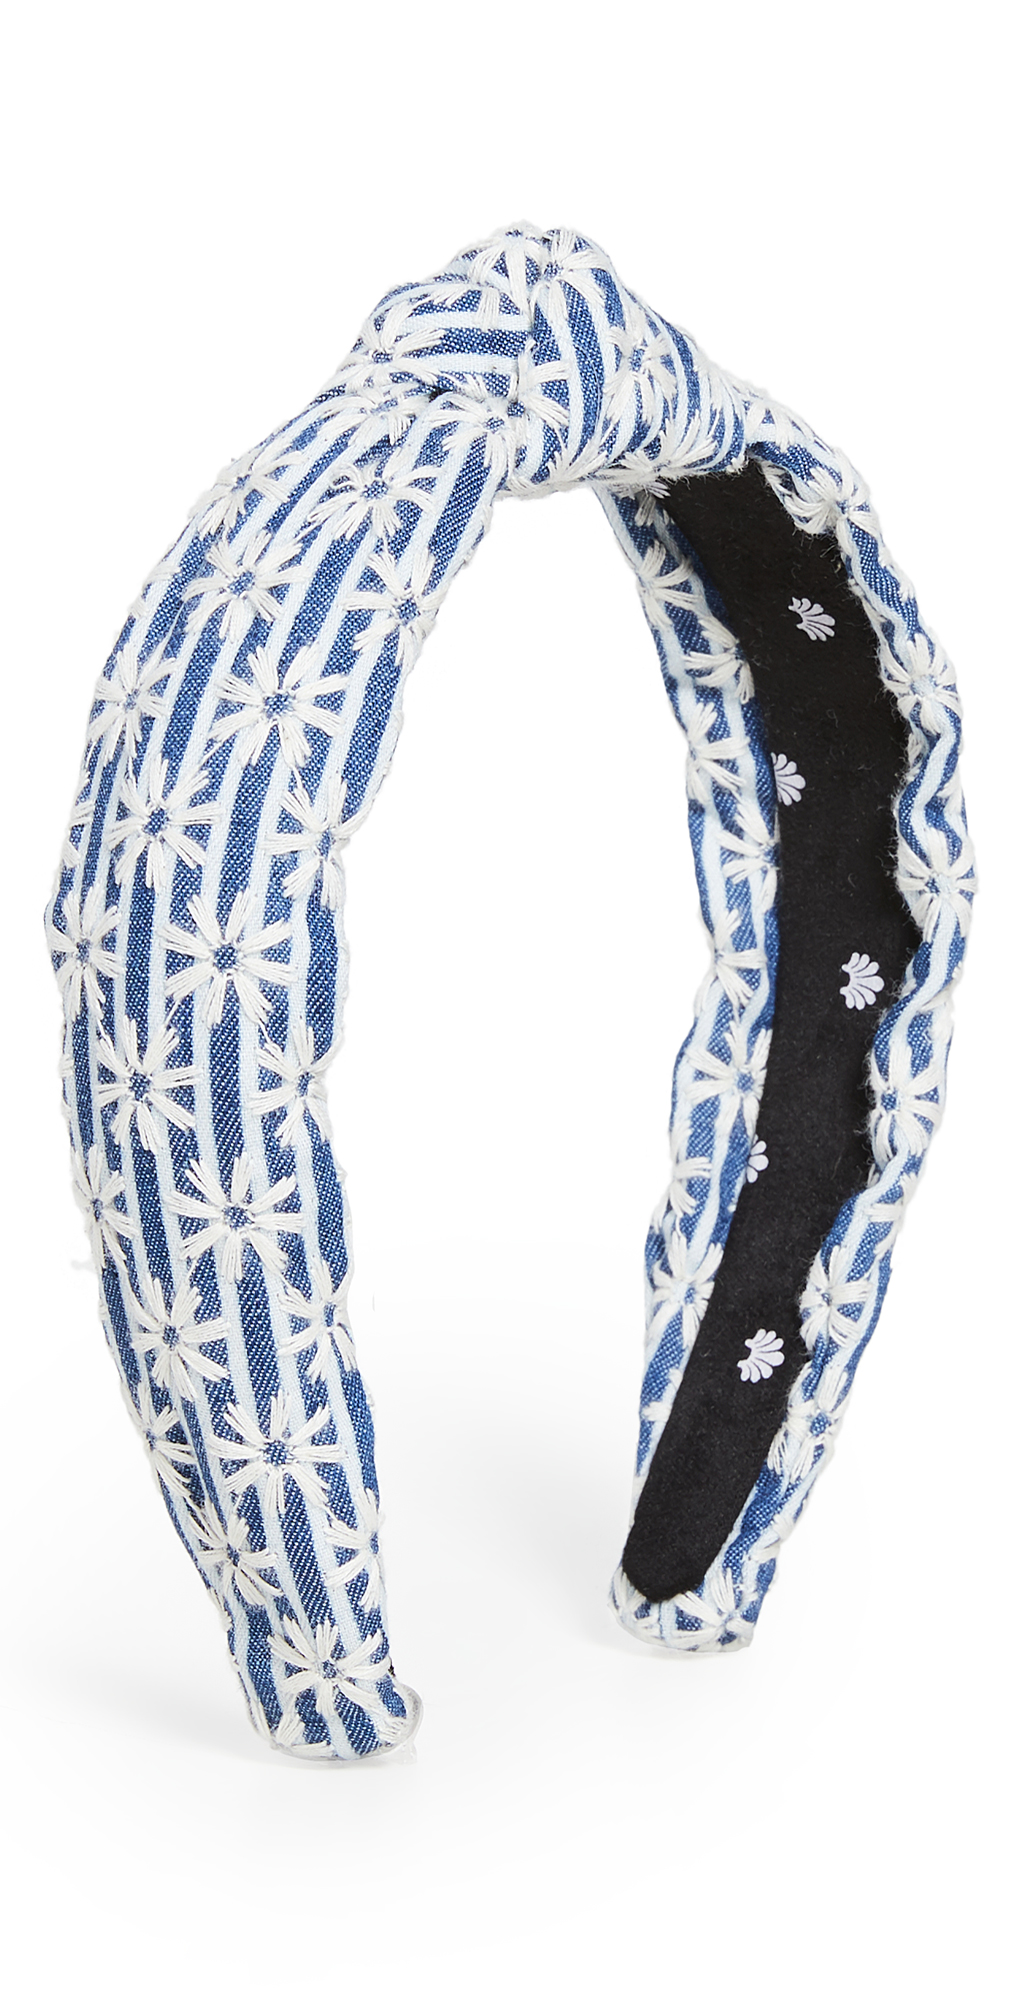 Lele Sadoughi Headbands STRIPED DAISY SLIM KNOTTED HEADBAND